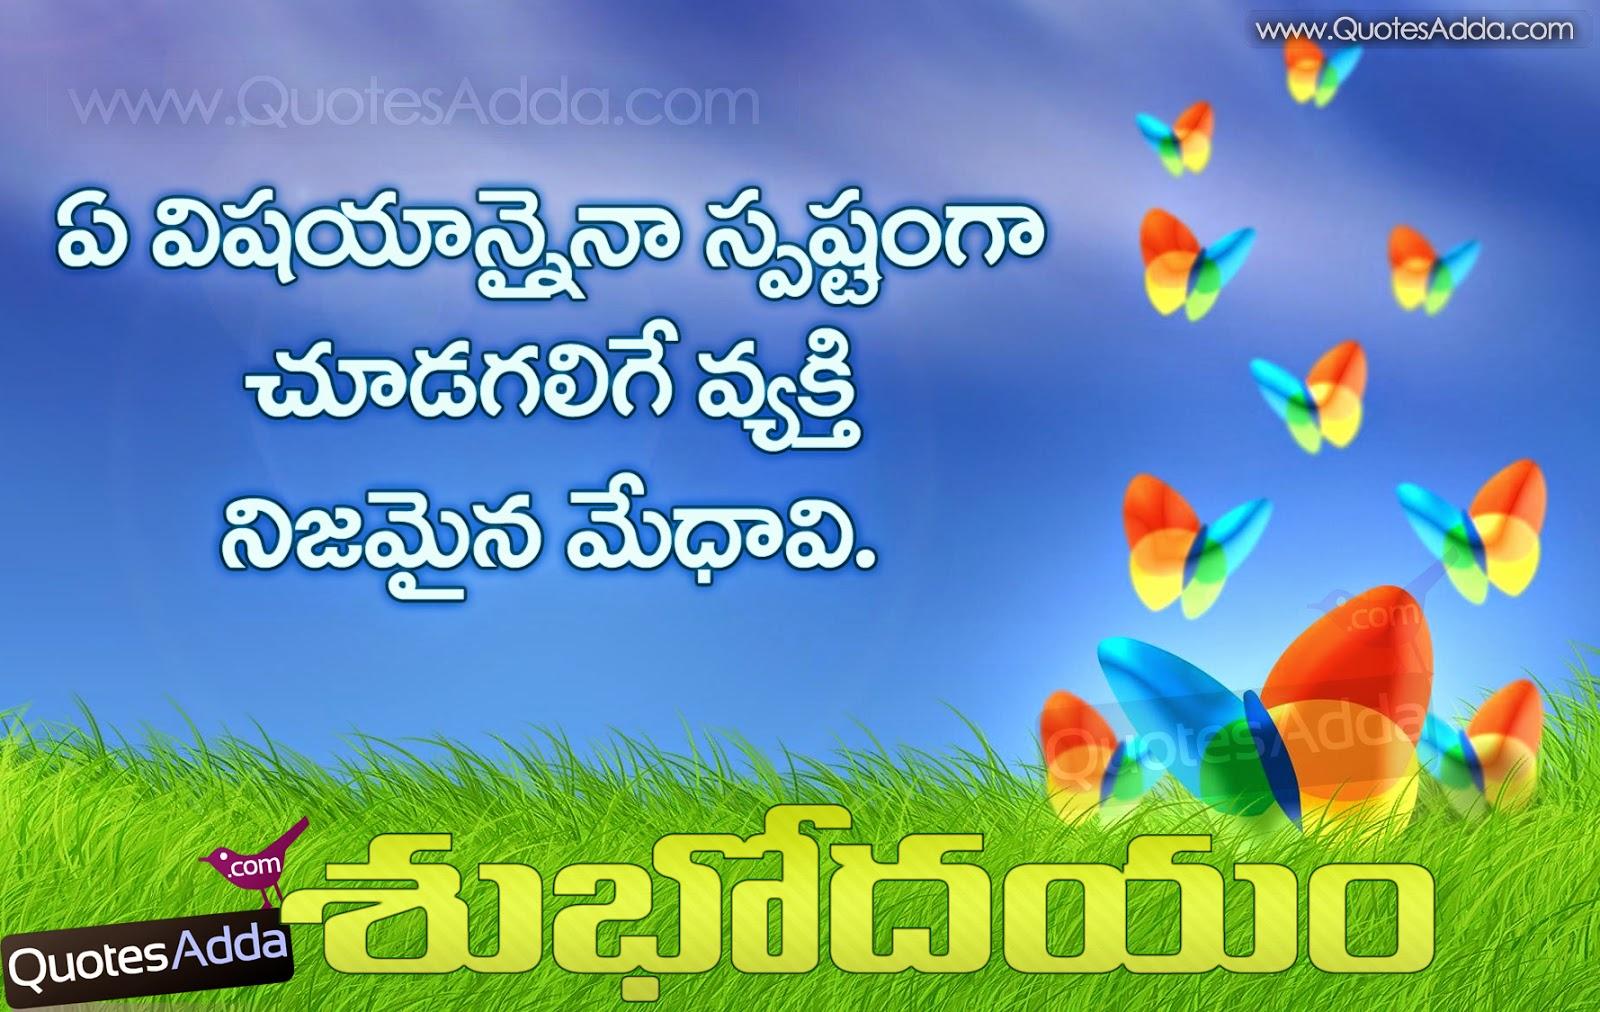 Latest Telugu Nice Good Morning Quotations | Quotes Adda.com | Telugu ...